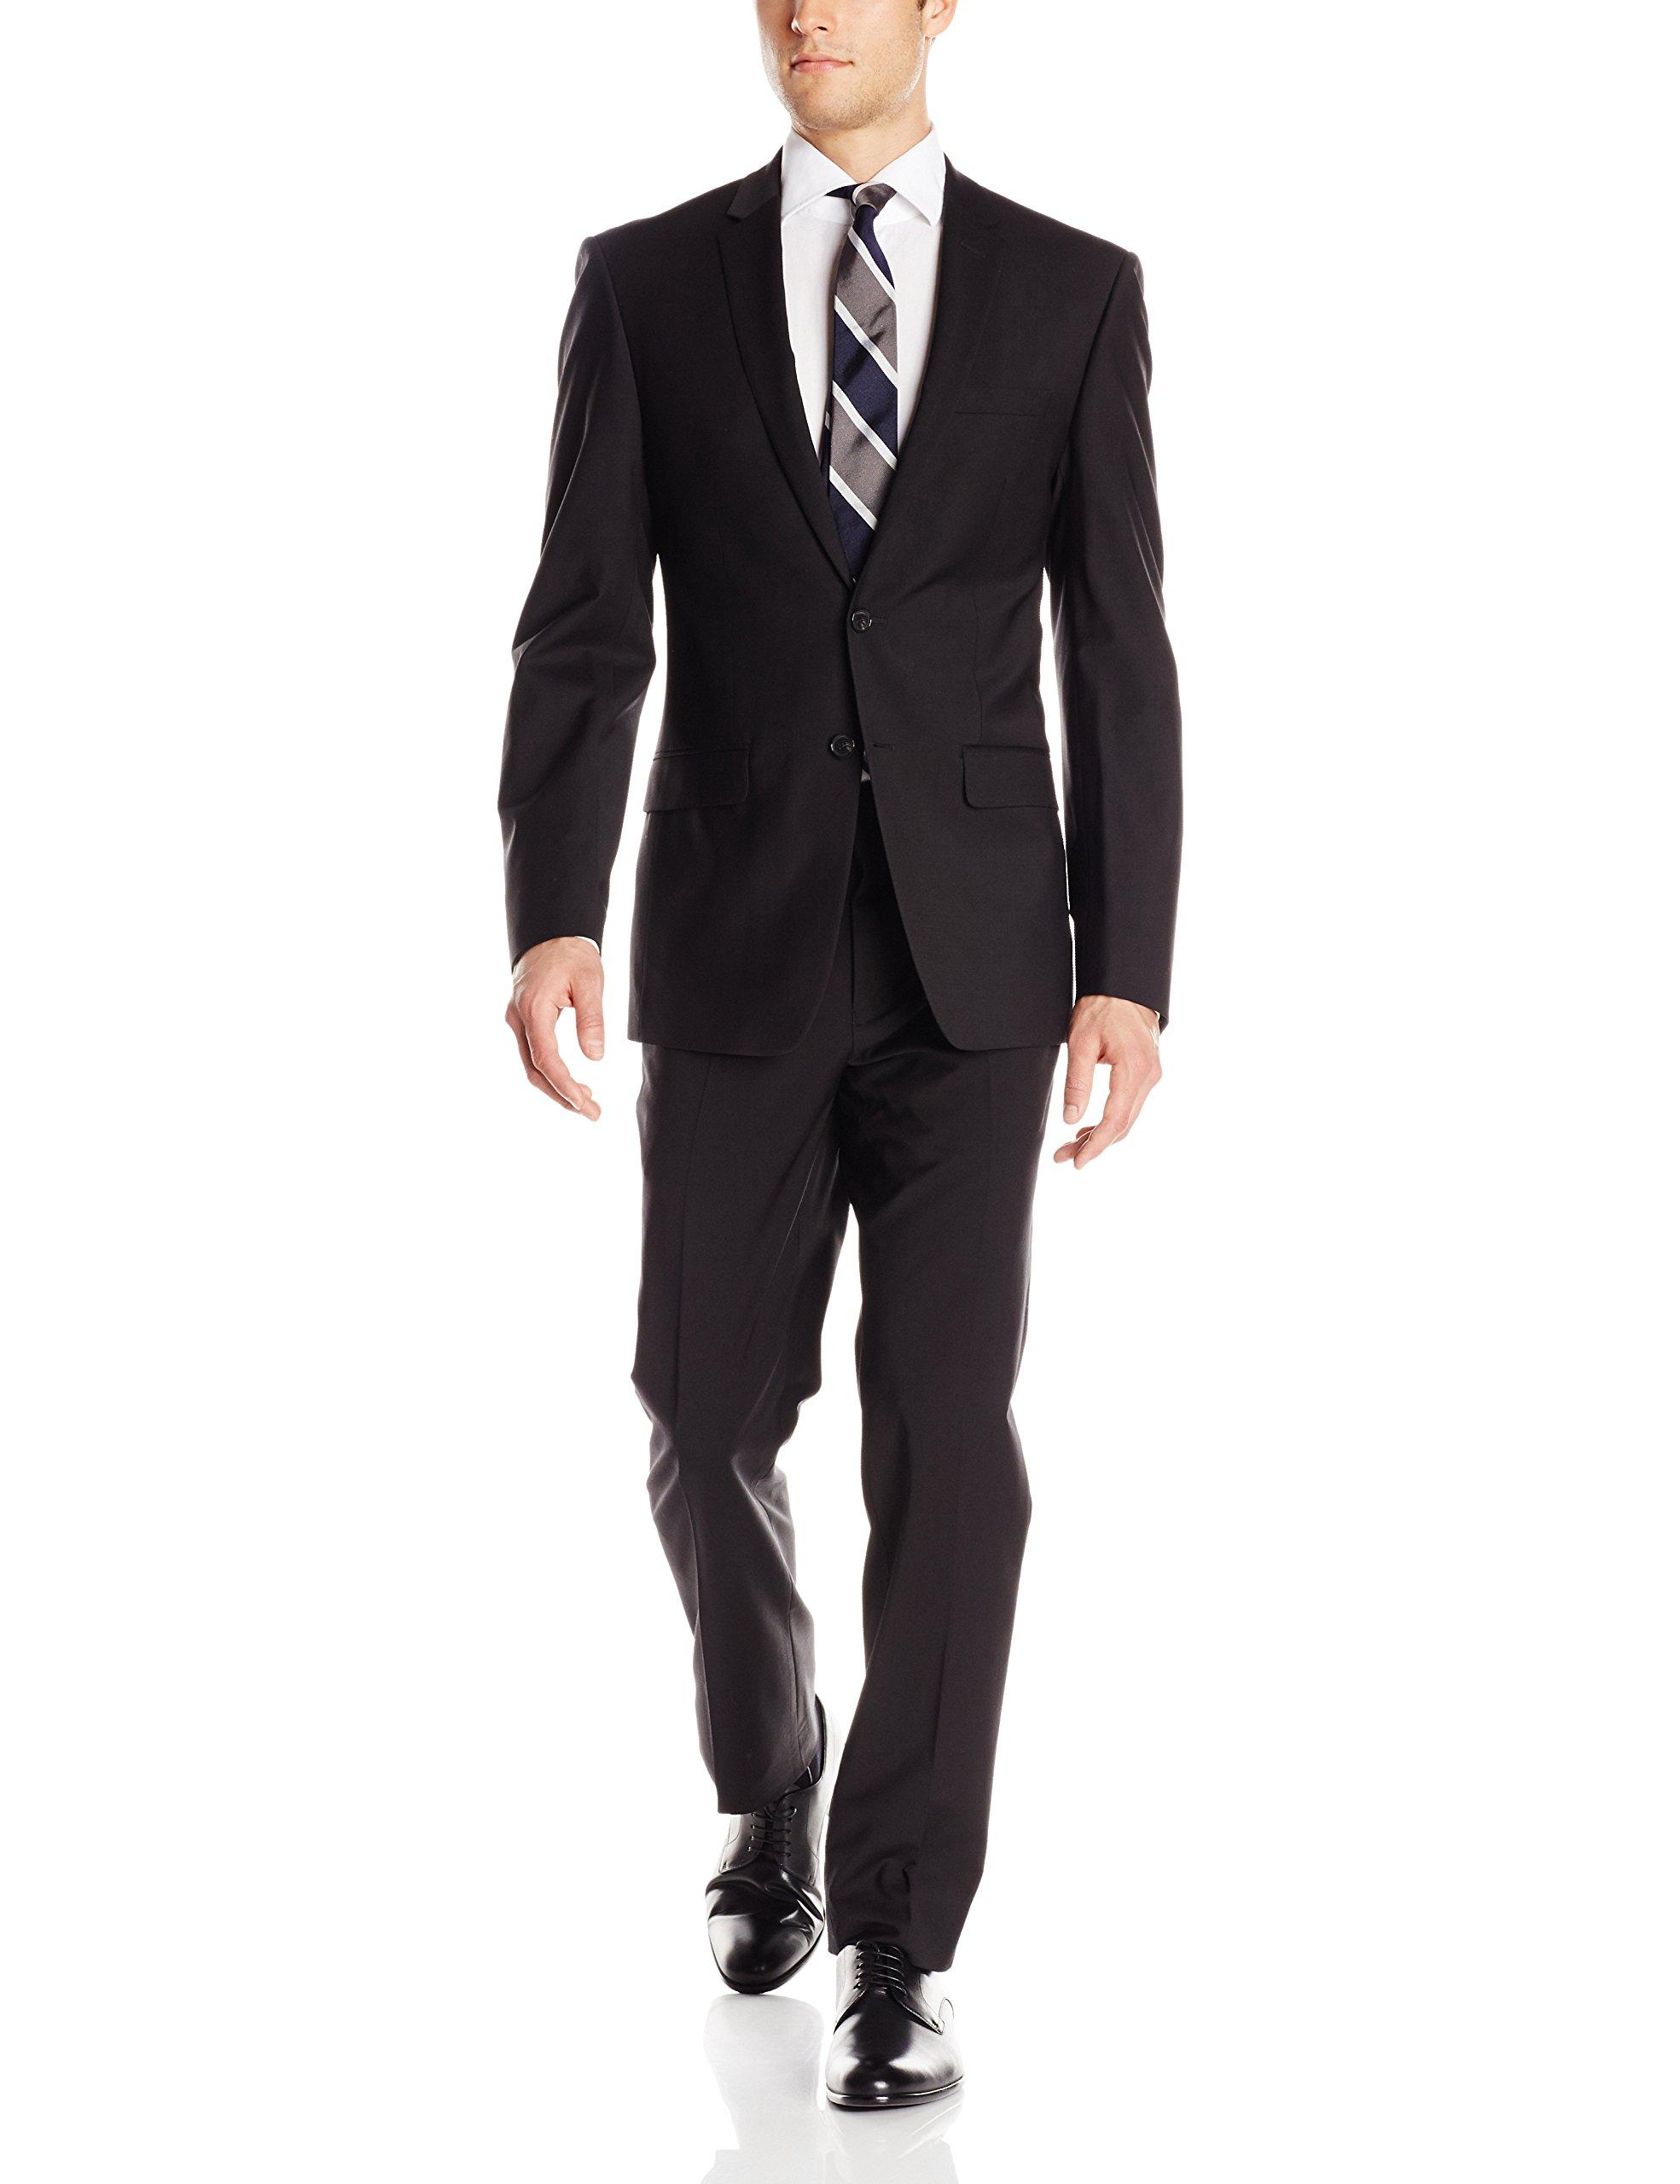 DKNY Men's Driver 2 Button Side Vent Modern Fit Suit 2 Piece, Black, 40/Regular